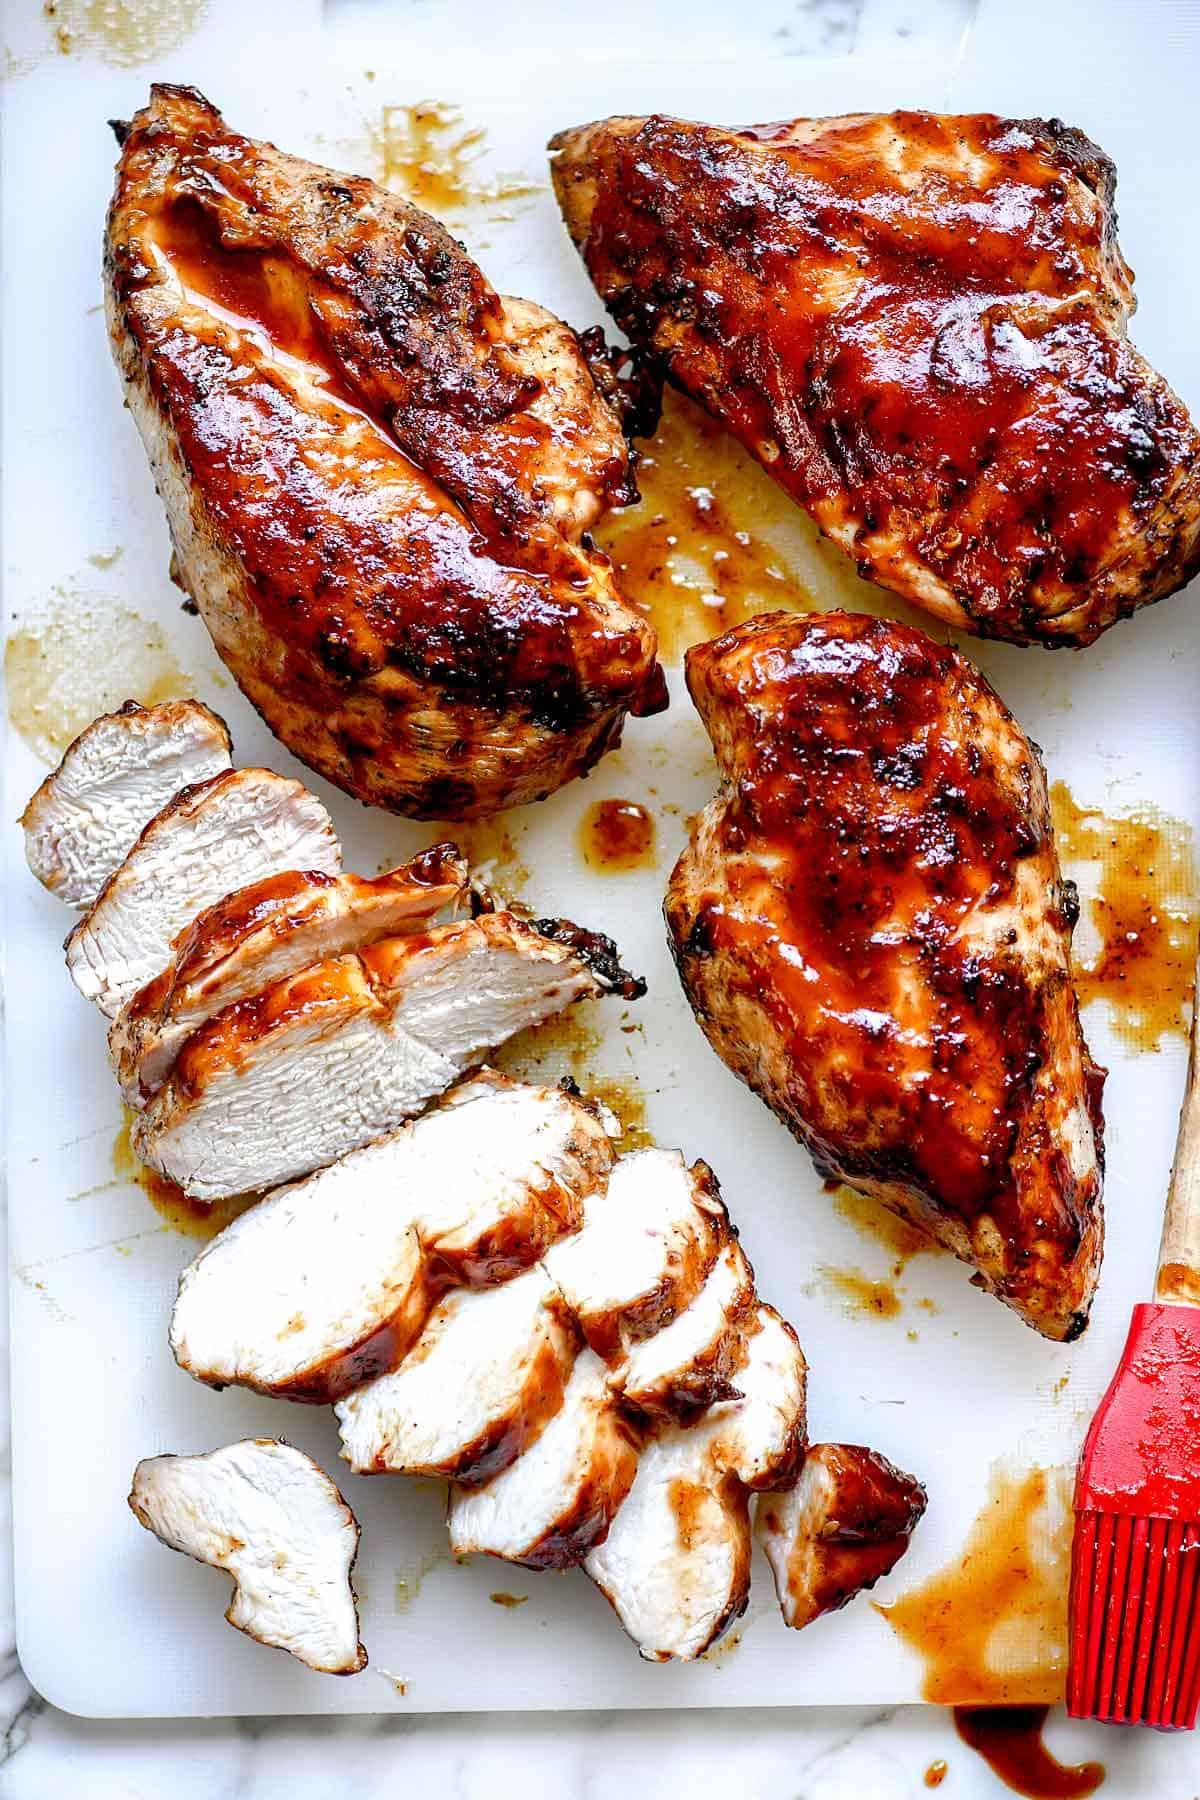 Boneless bbq chicken breasts